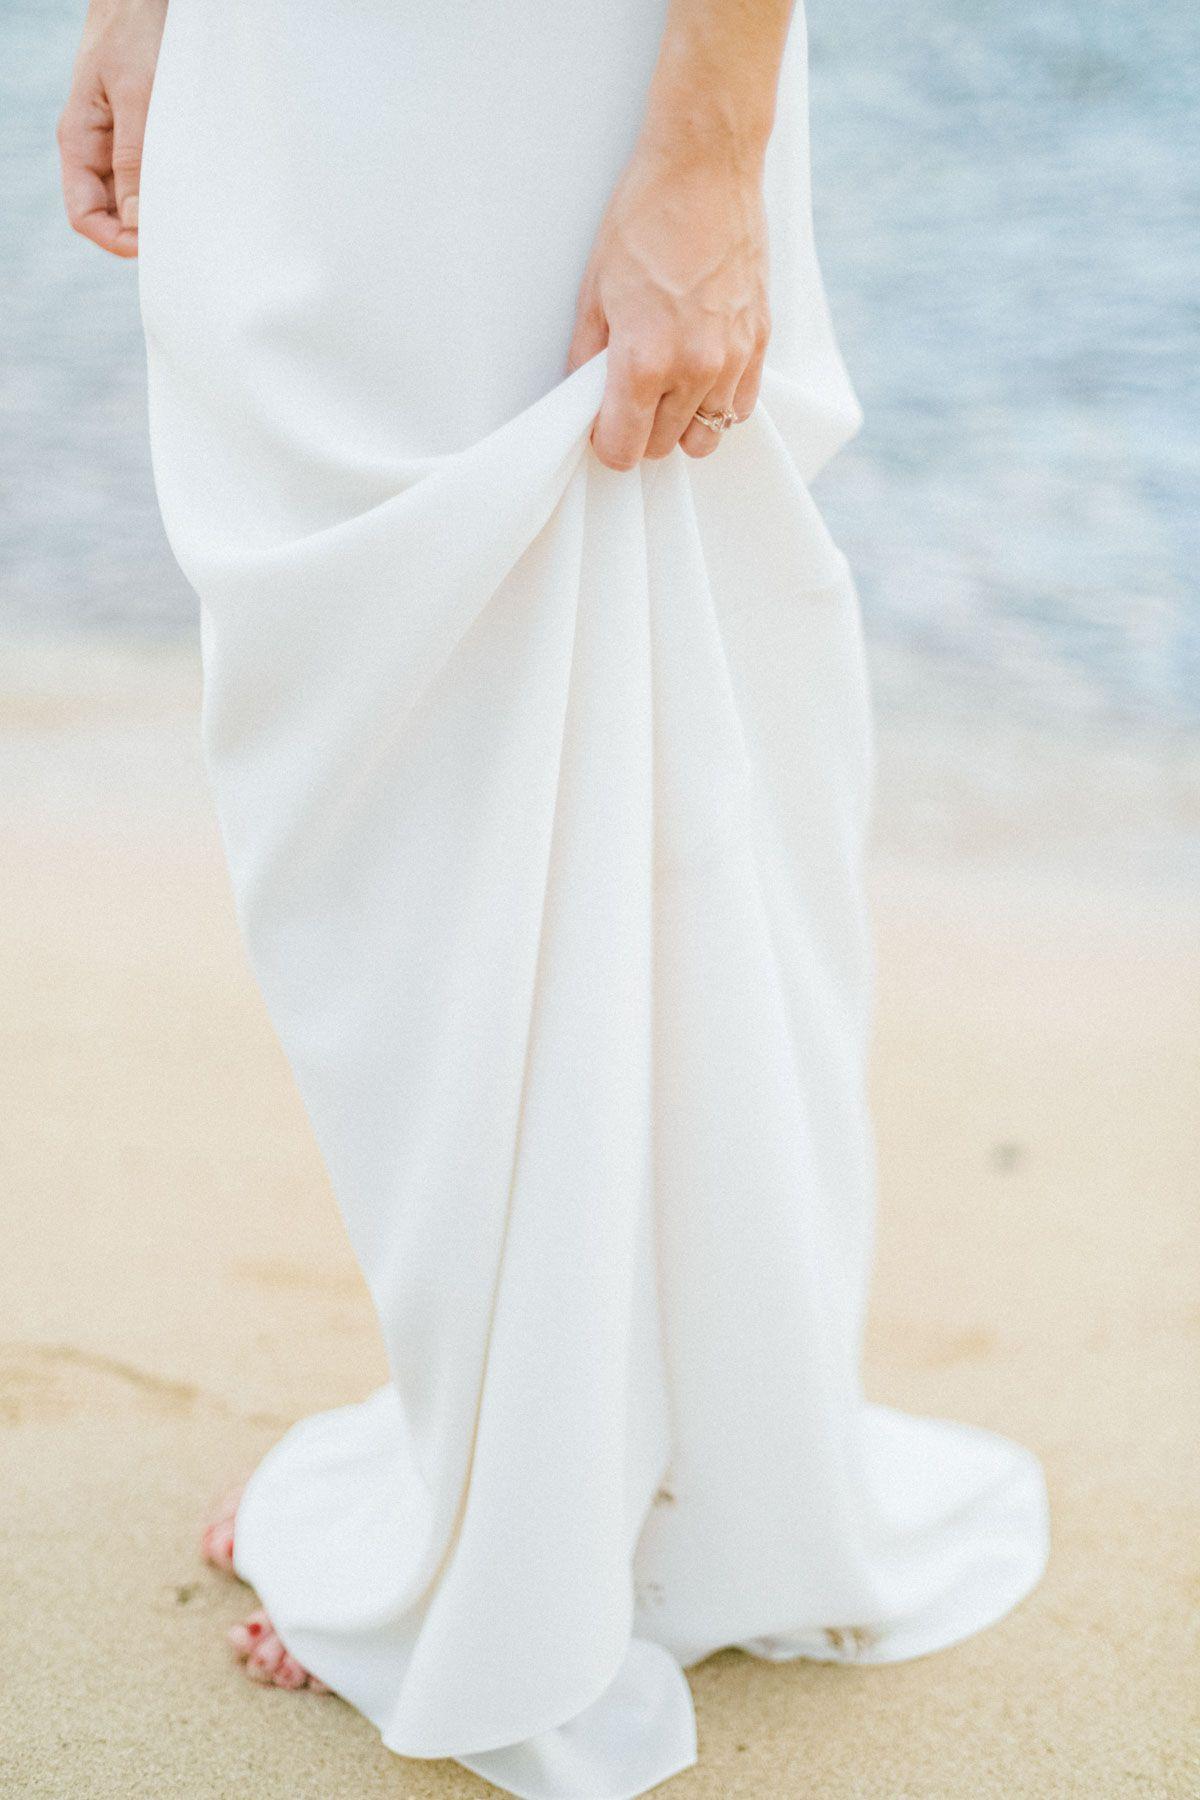 Oahu hawaii destination wedding photographer bride with white